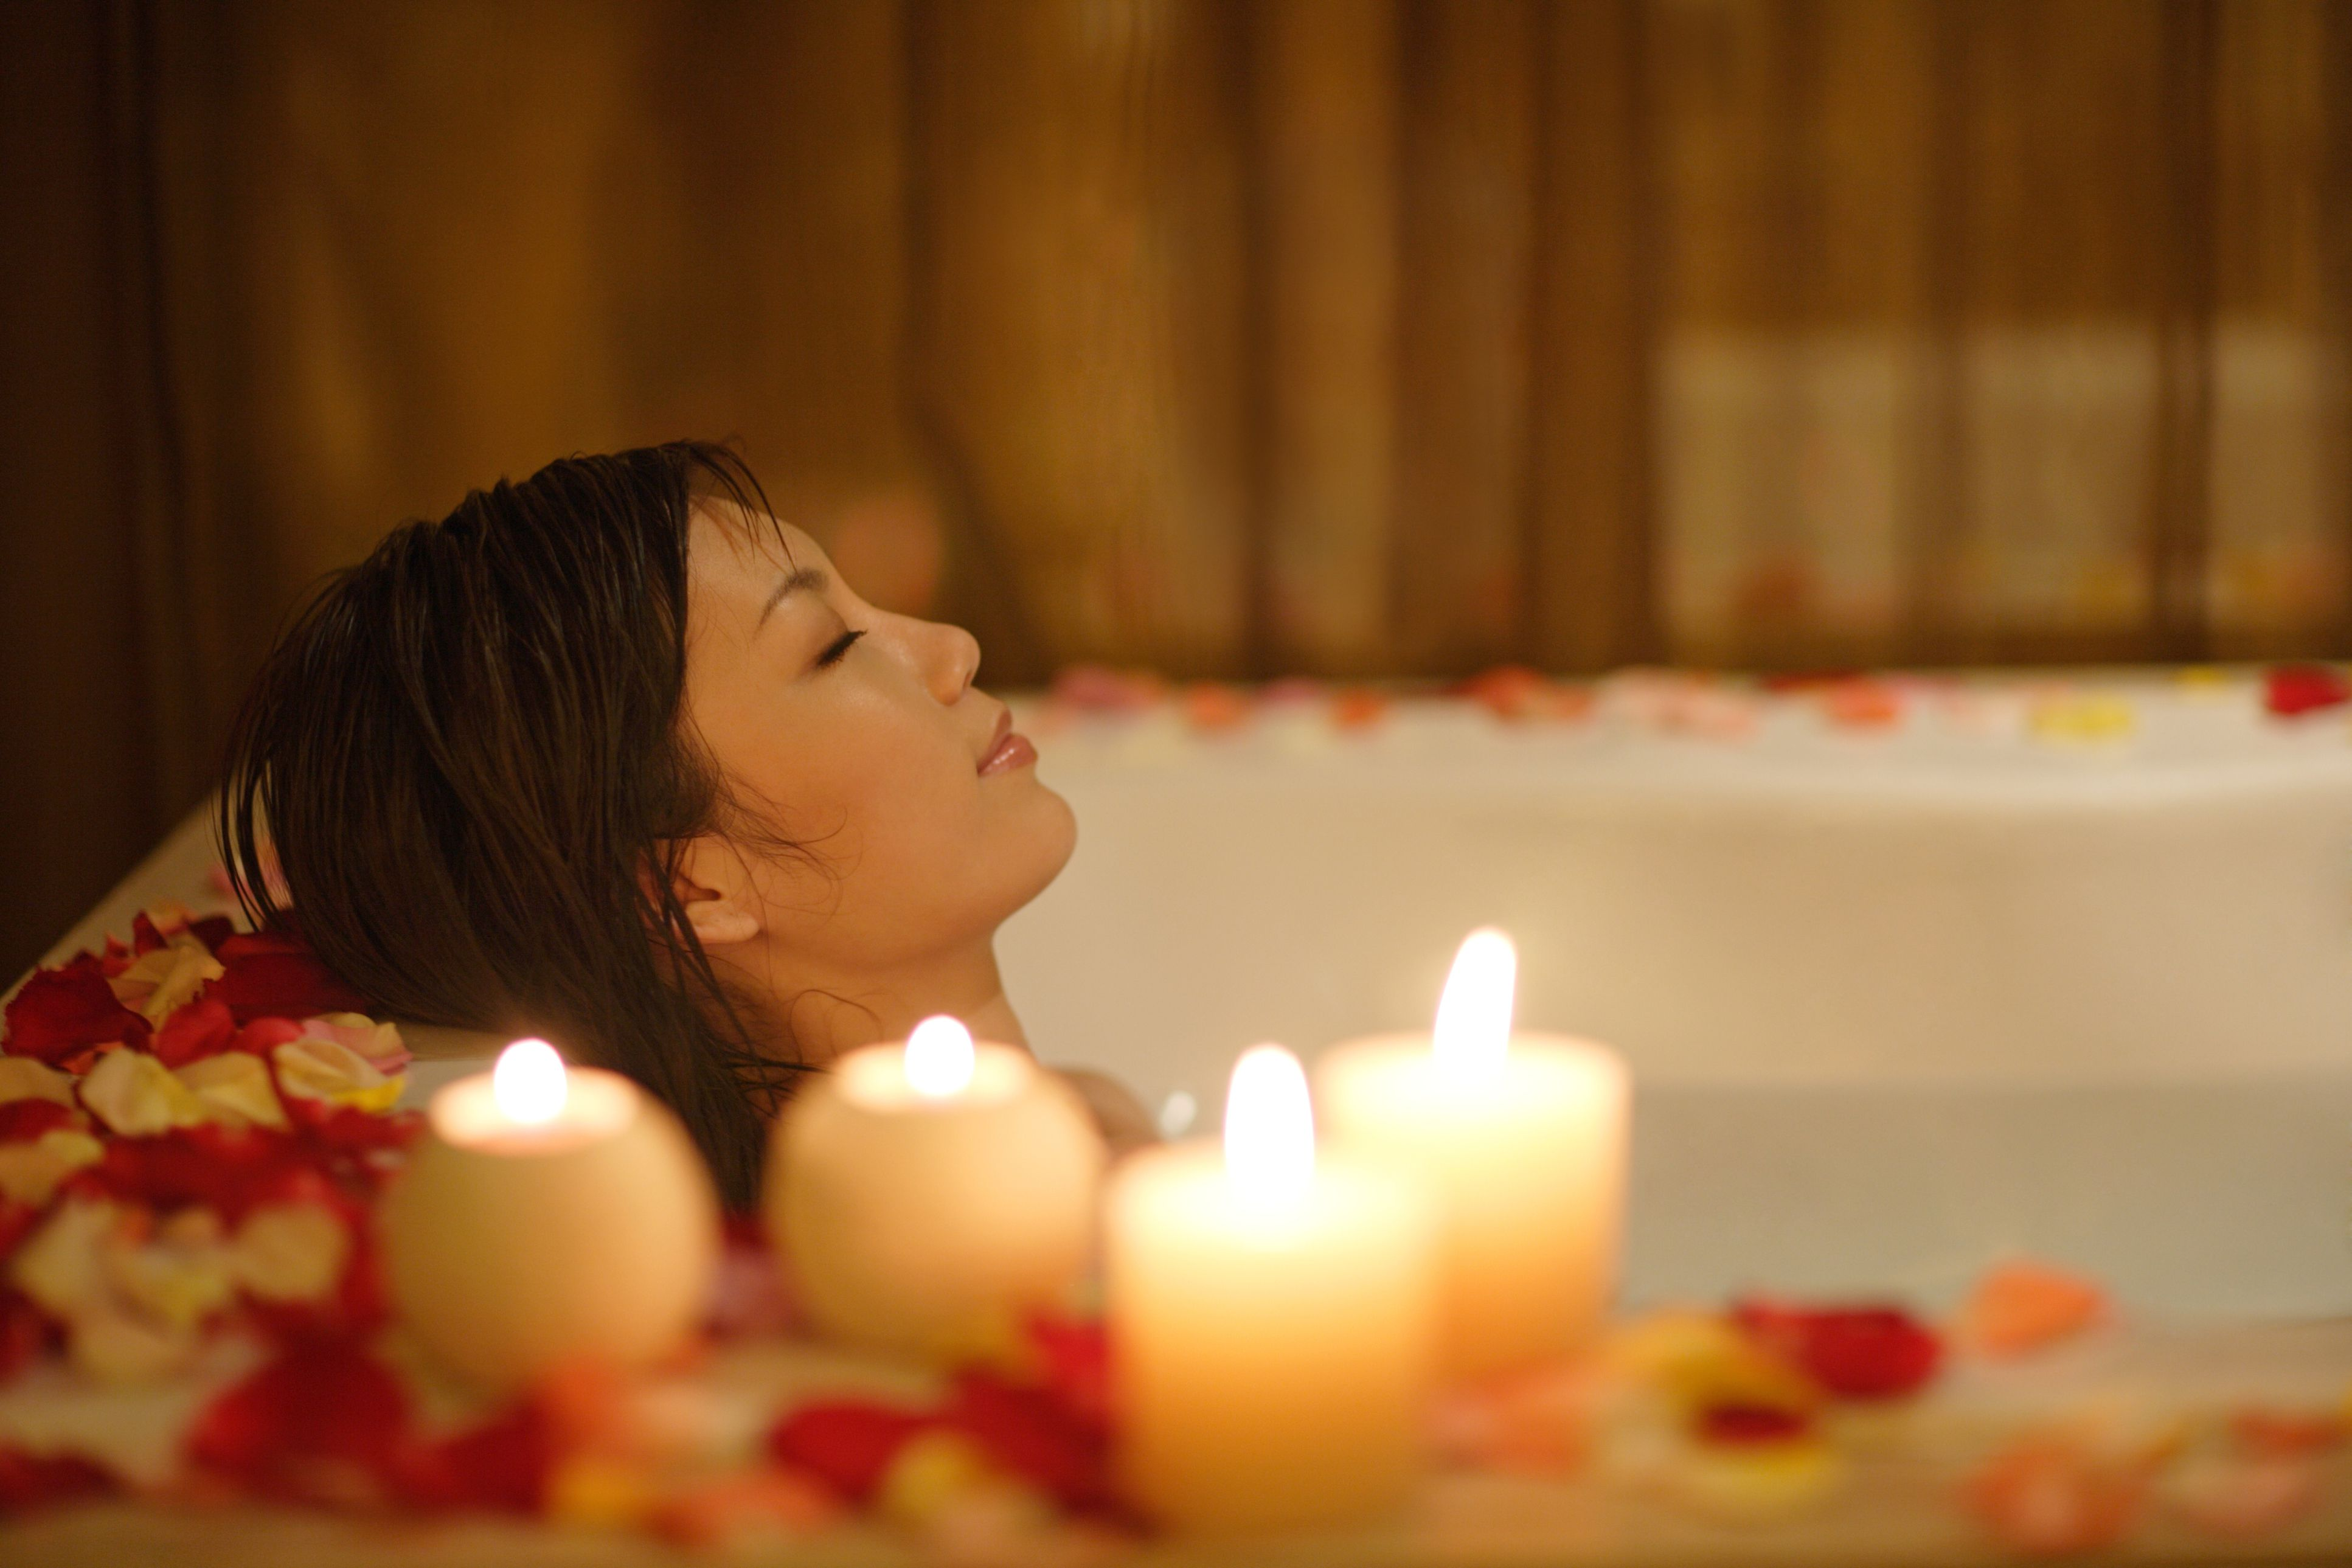 A ritual massage techniques - 3 8